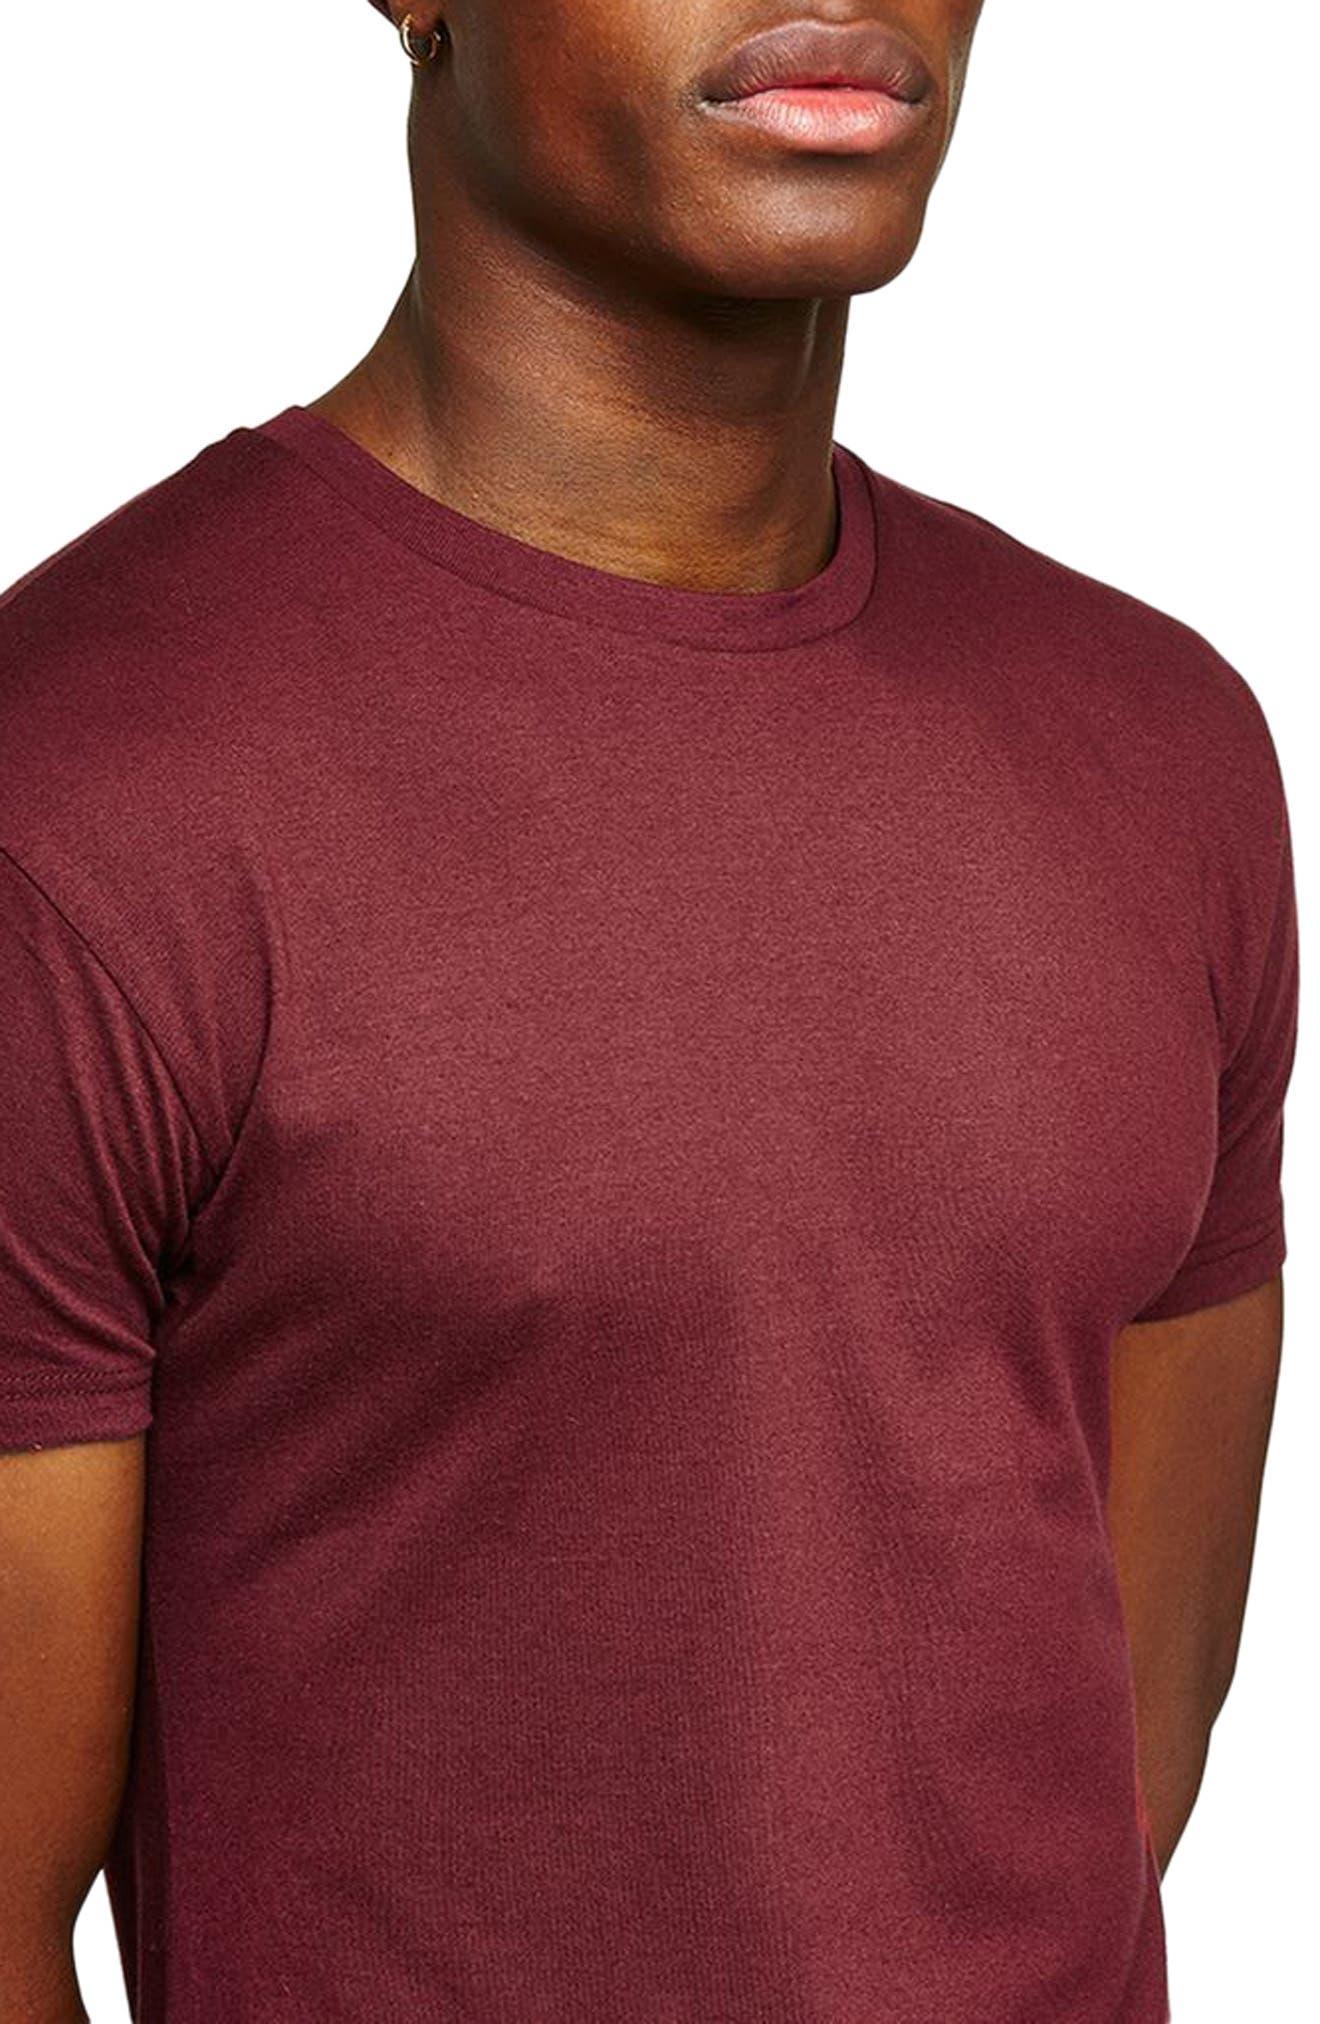 Muscle Fit Longline T-Shirt,                             Alternate thumbnail 3, color,                             930